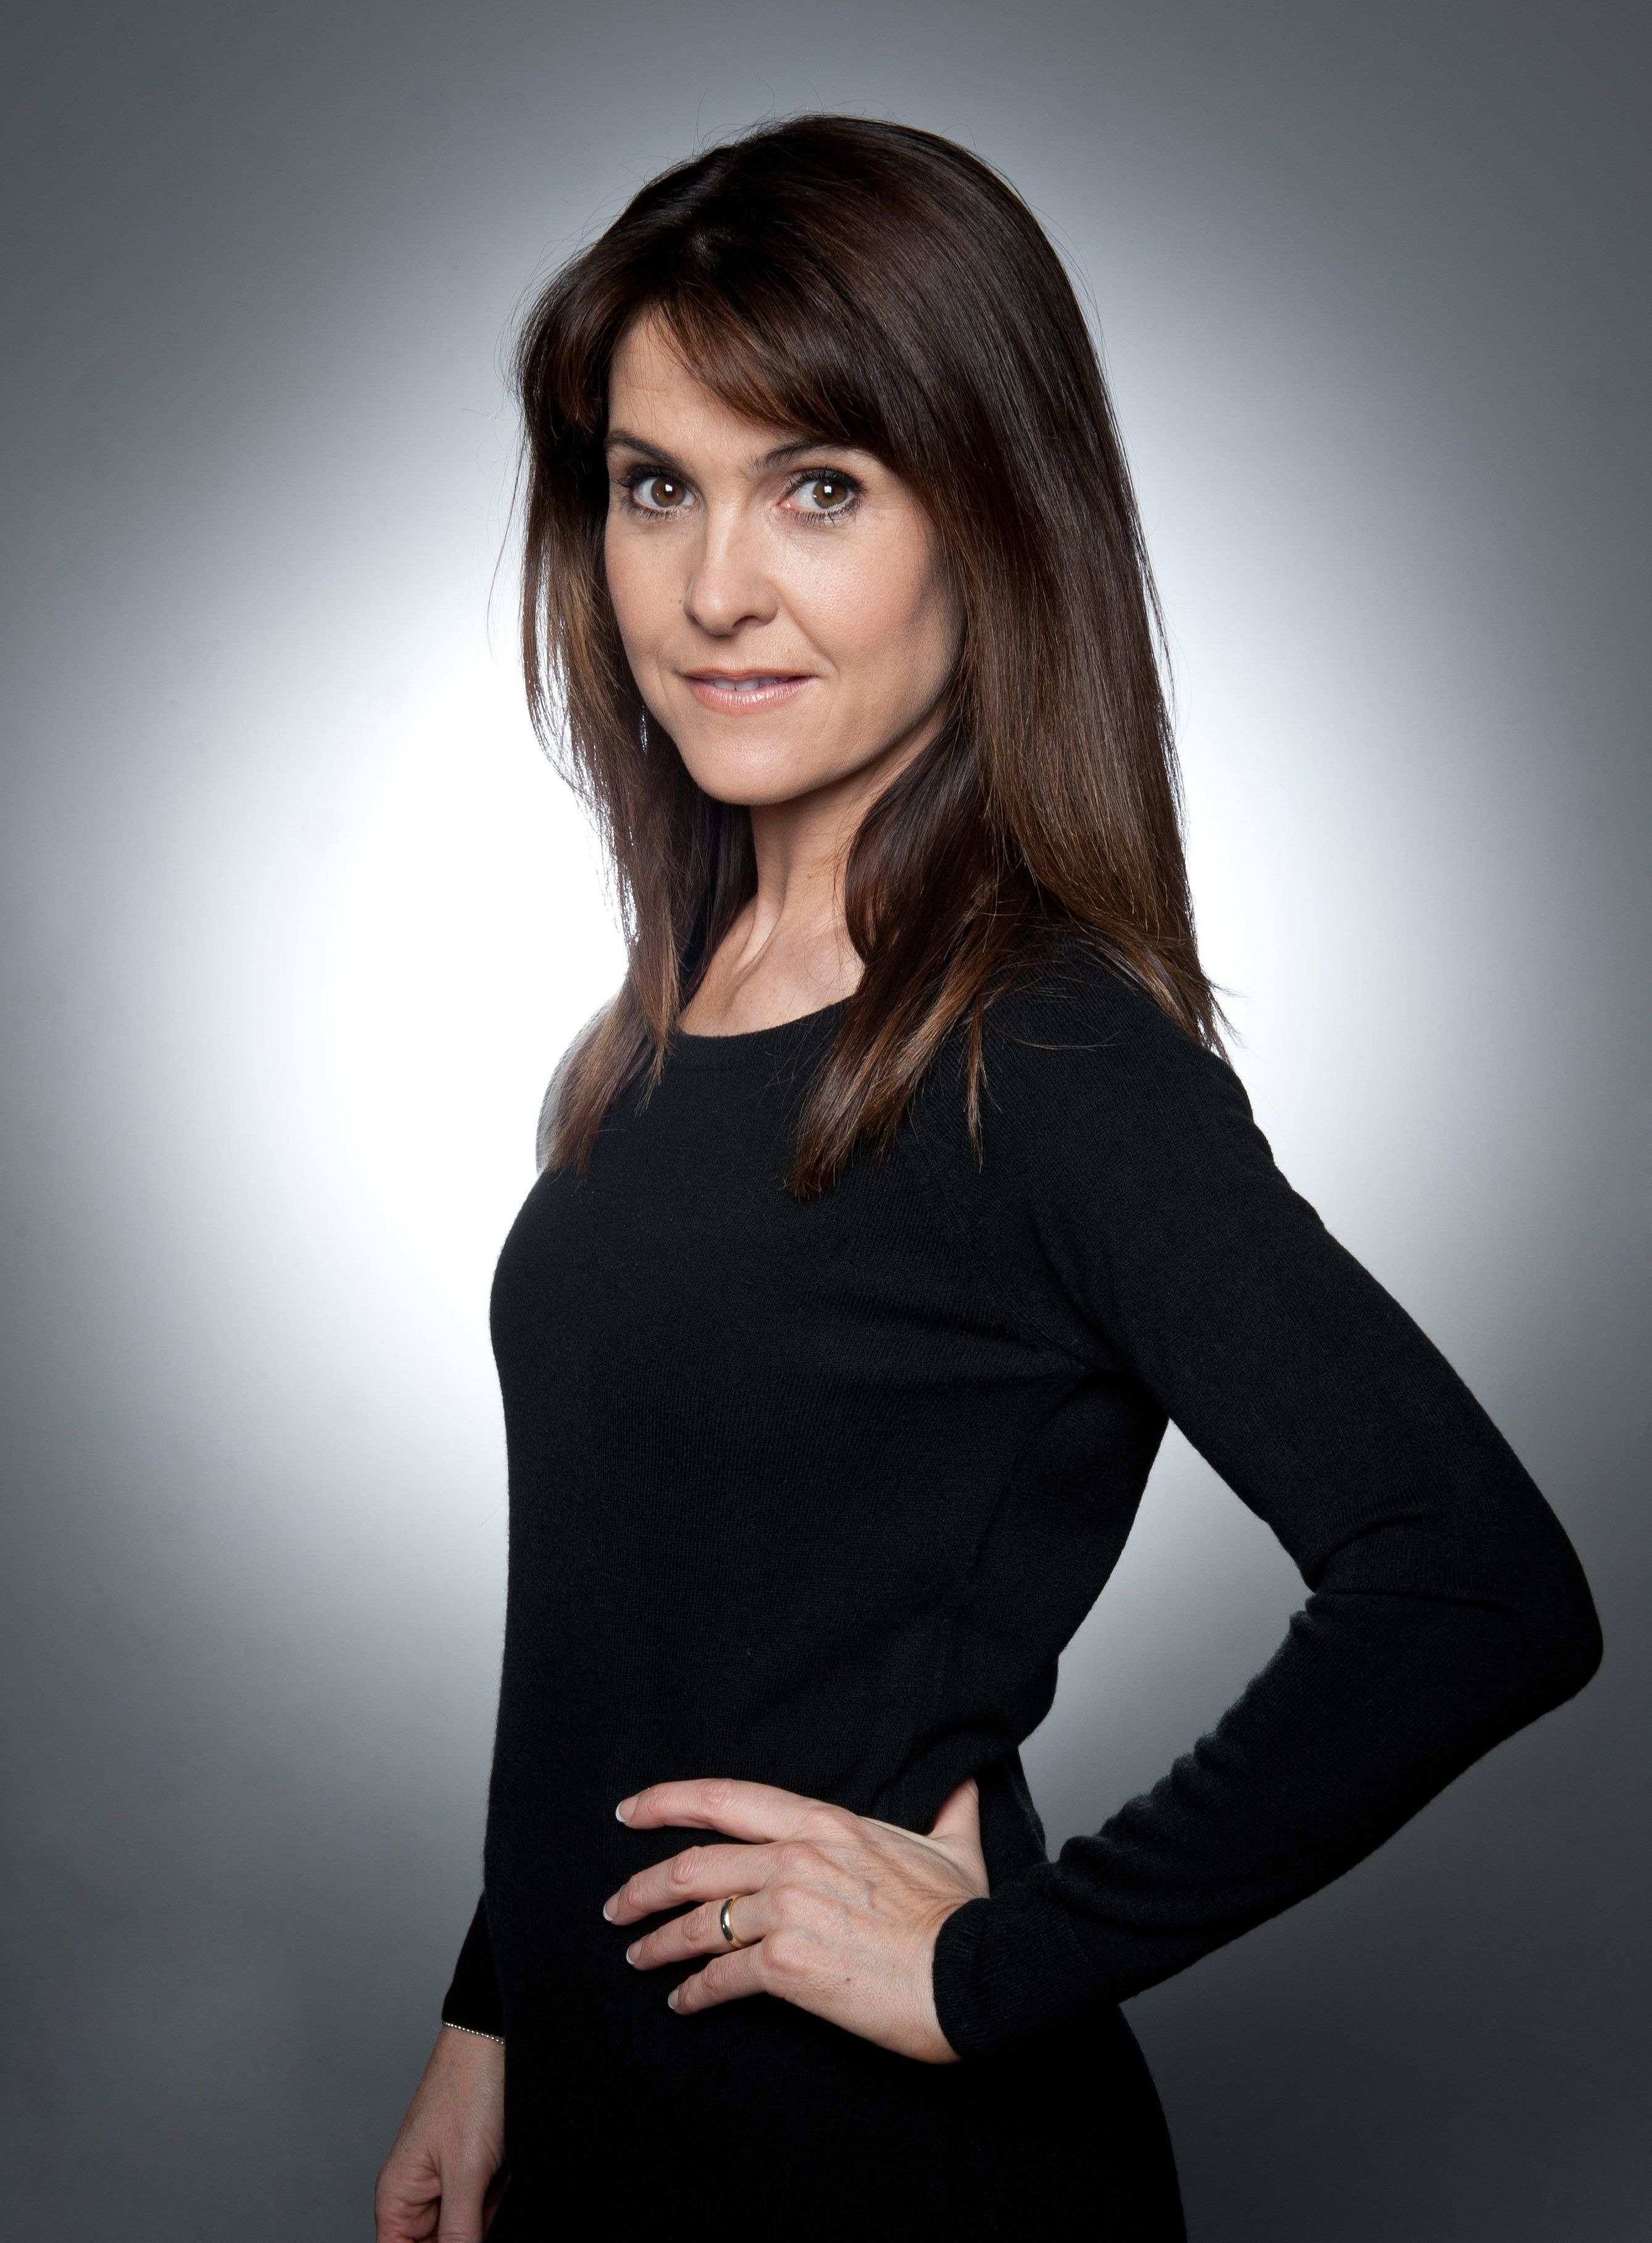 Spoiler! 'Emmerdale' Boss Reveals Emma Barton Exit